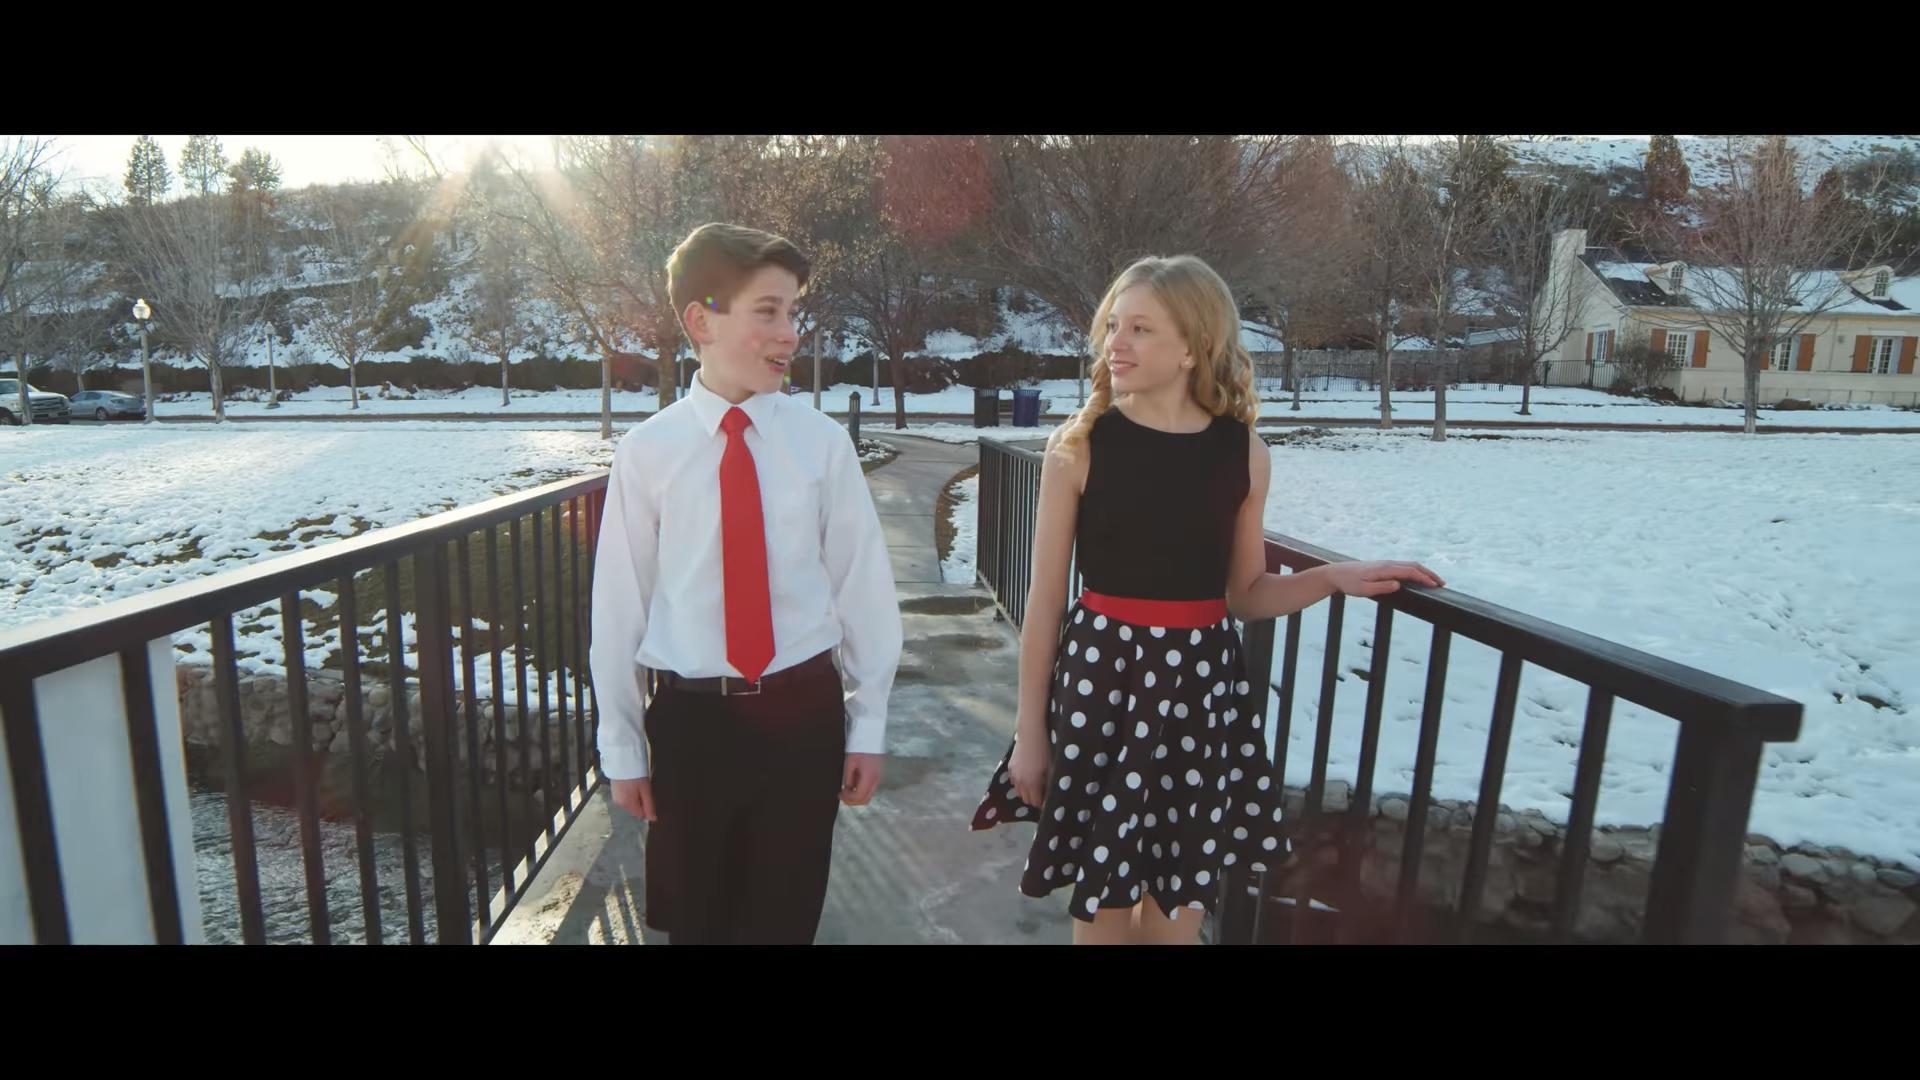 Micah Harmon and Lyza Bull - A Million Dreams